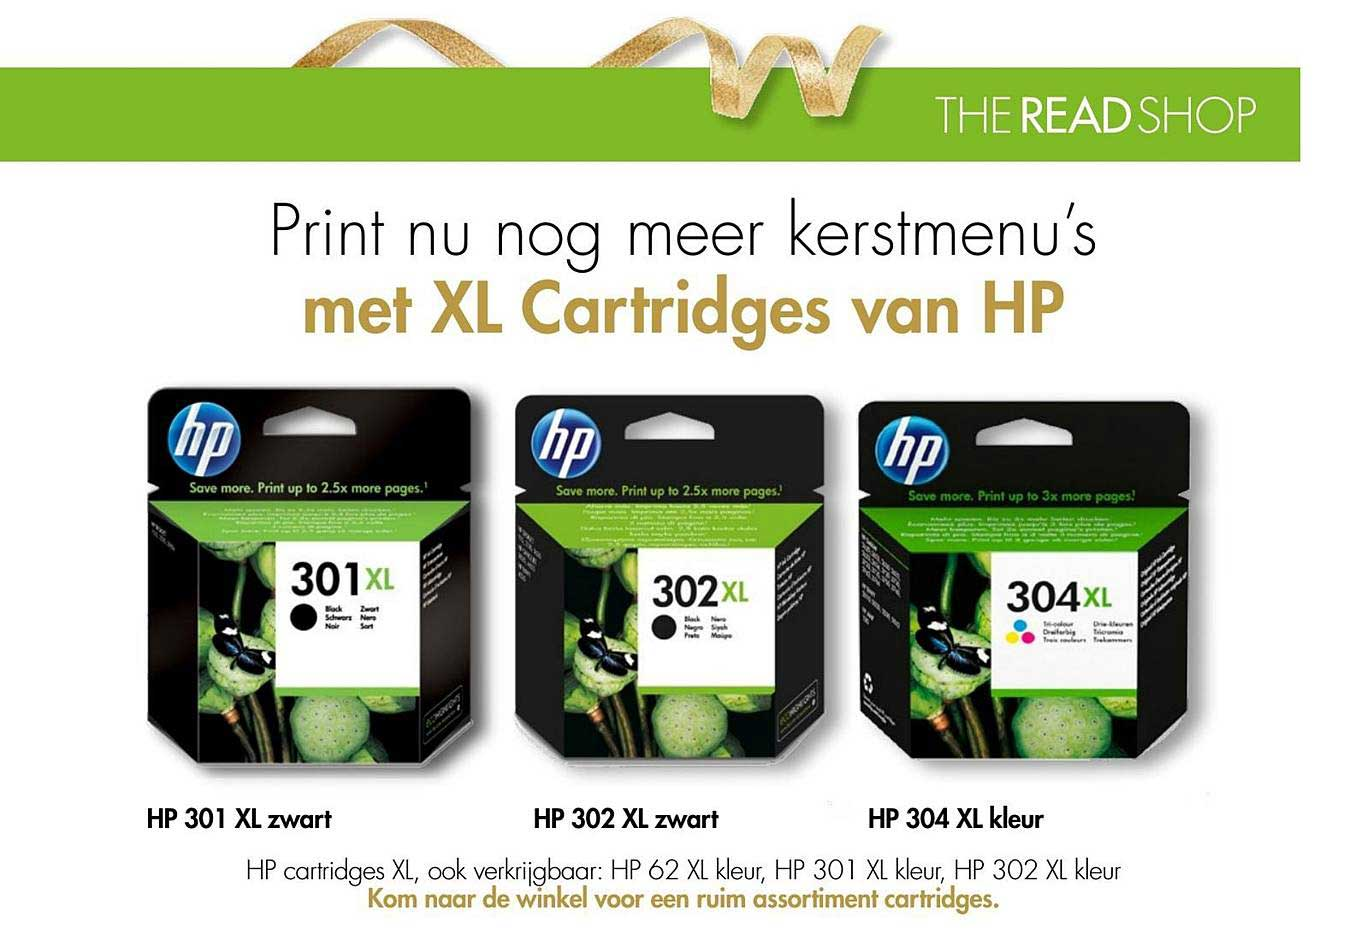 The Read Shop XL Cartridges Van HP